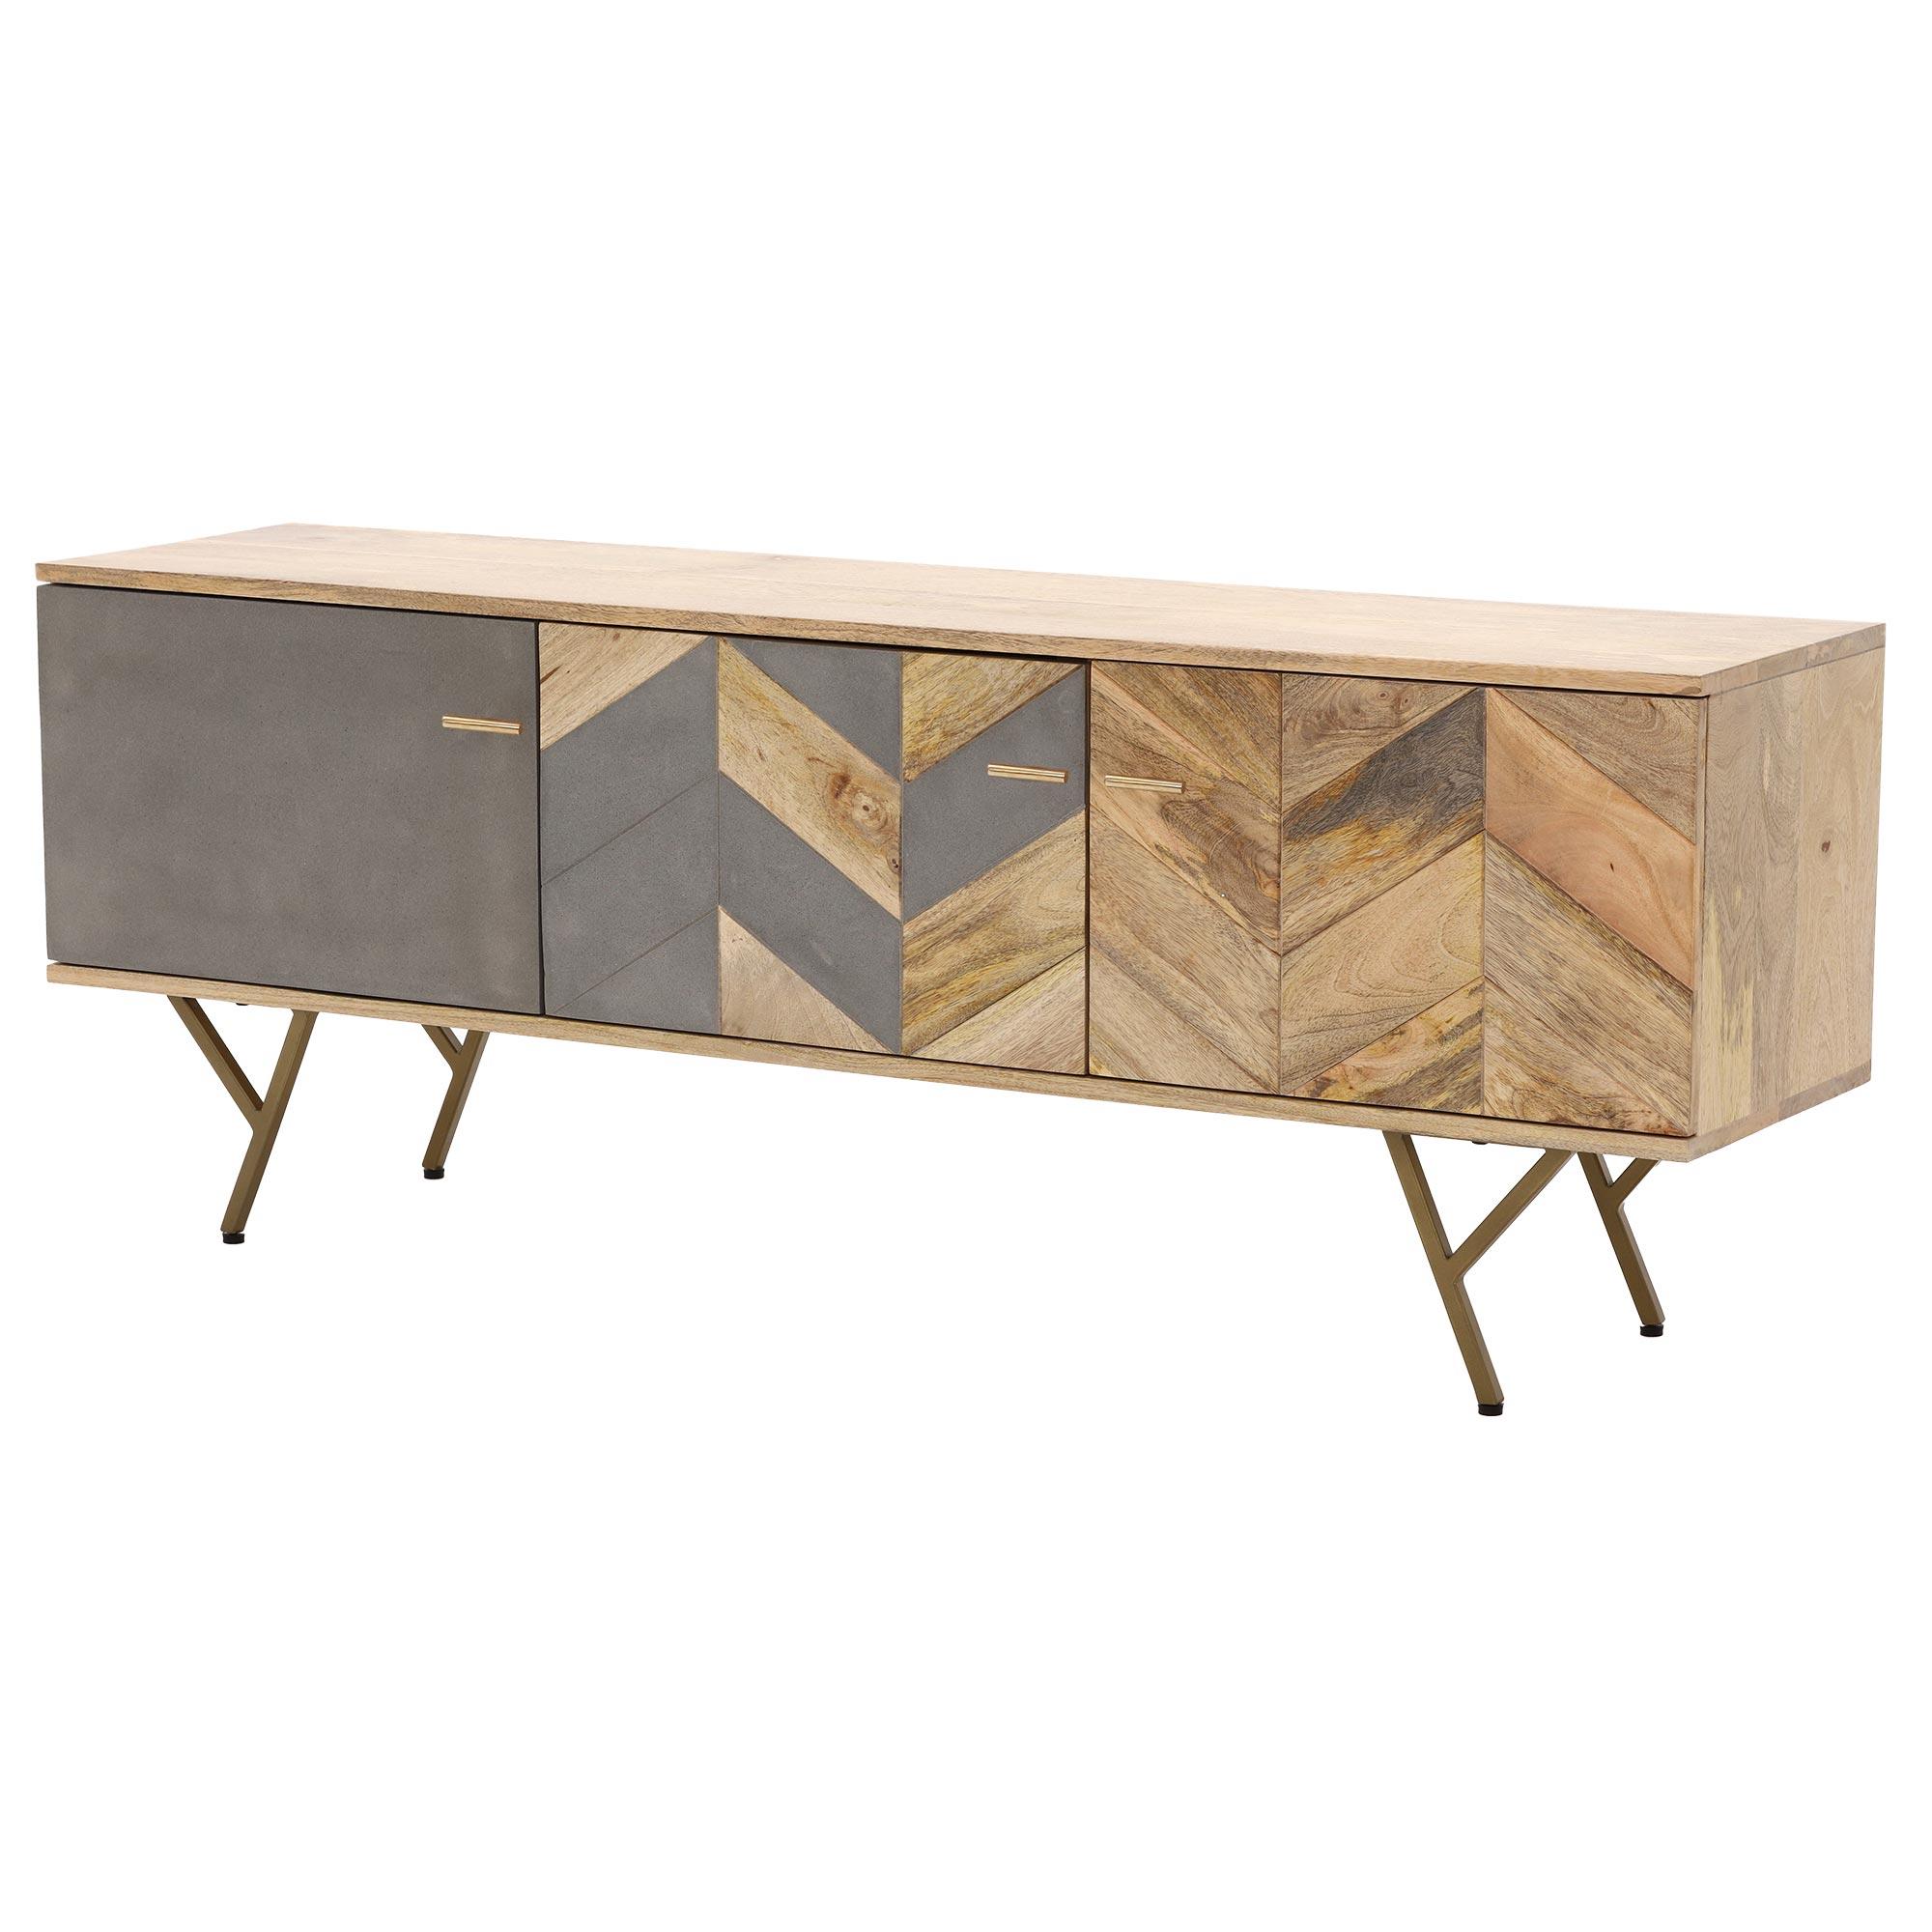 Mango Wood Tv Cabinets Regarding Favorite Kerala Tv Cabinet, Mango Wood, Concrete And Brass (View 4 of 20)